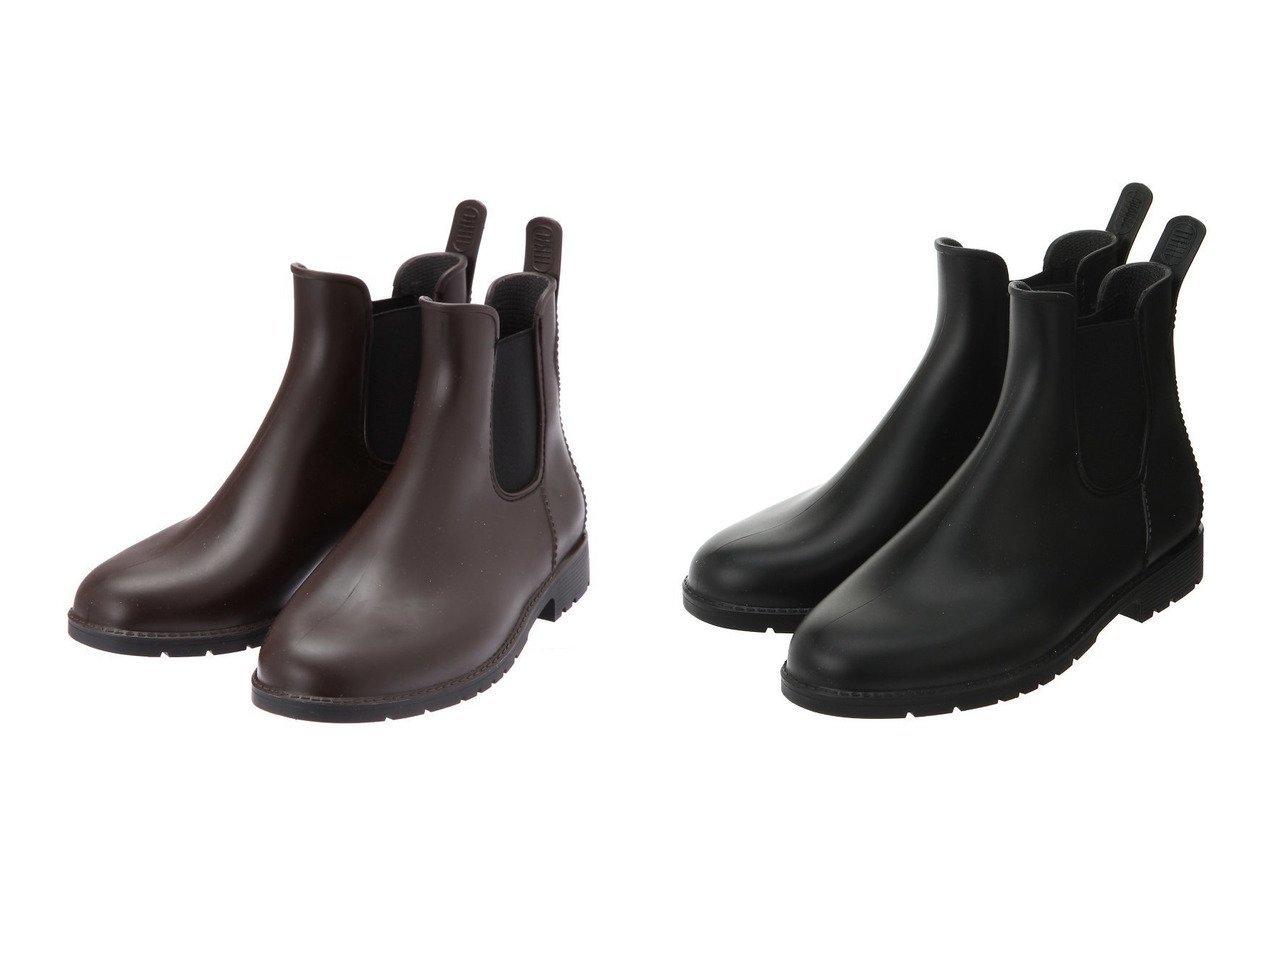 【BEAUTY&YOUTH UNITED ARROWS/ビューティアンド ユースユナイテッドアローズ】のBYRI meduse サイドゴア ショートレインブーツ ¨ シューズ・靴のおすすめ!人気、トレンド・レディースファッションの通販 おすすめで人気の流行・トレンド、ファッションの通販商品 メンズファッション・キッズファッション・インテリア・家具・レディースファッション・服の通販 founy(ファニー) https://founy.com/ ファッション Fashion レディースファッション WOMEN シューズ ショート フォルム フランス プレーン |ID:crp329100000012959